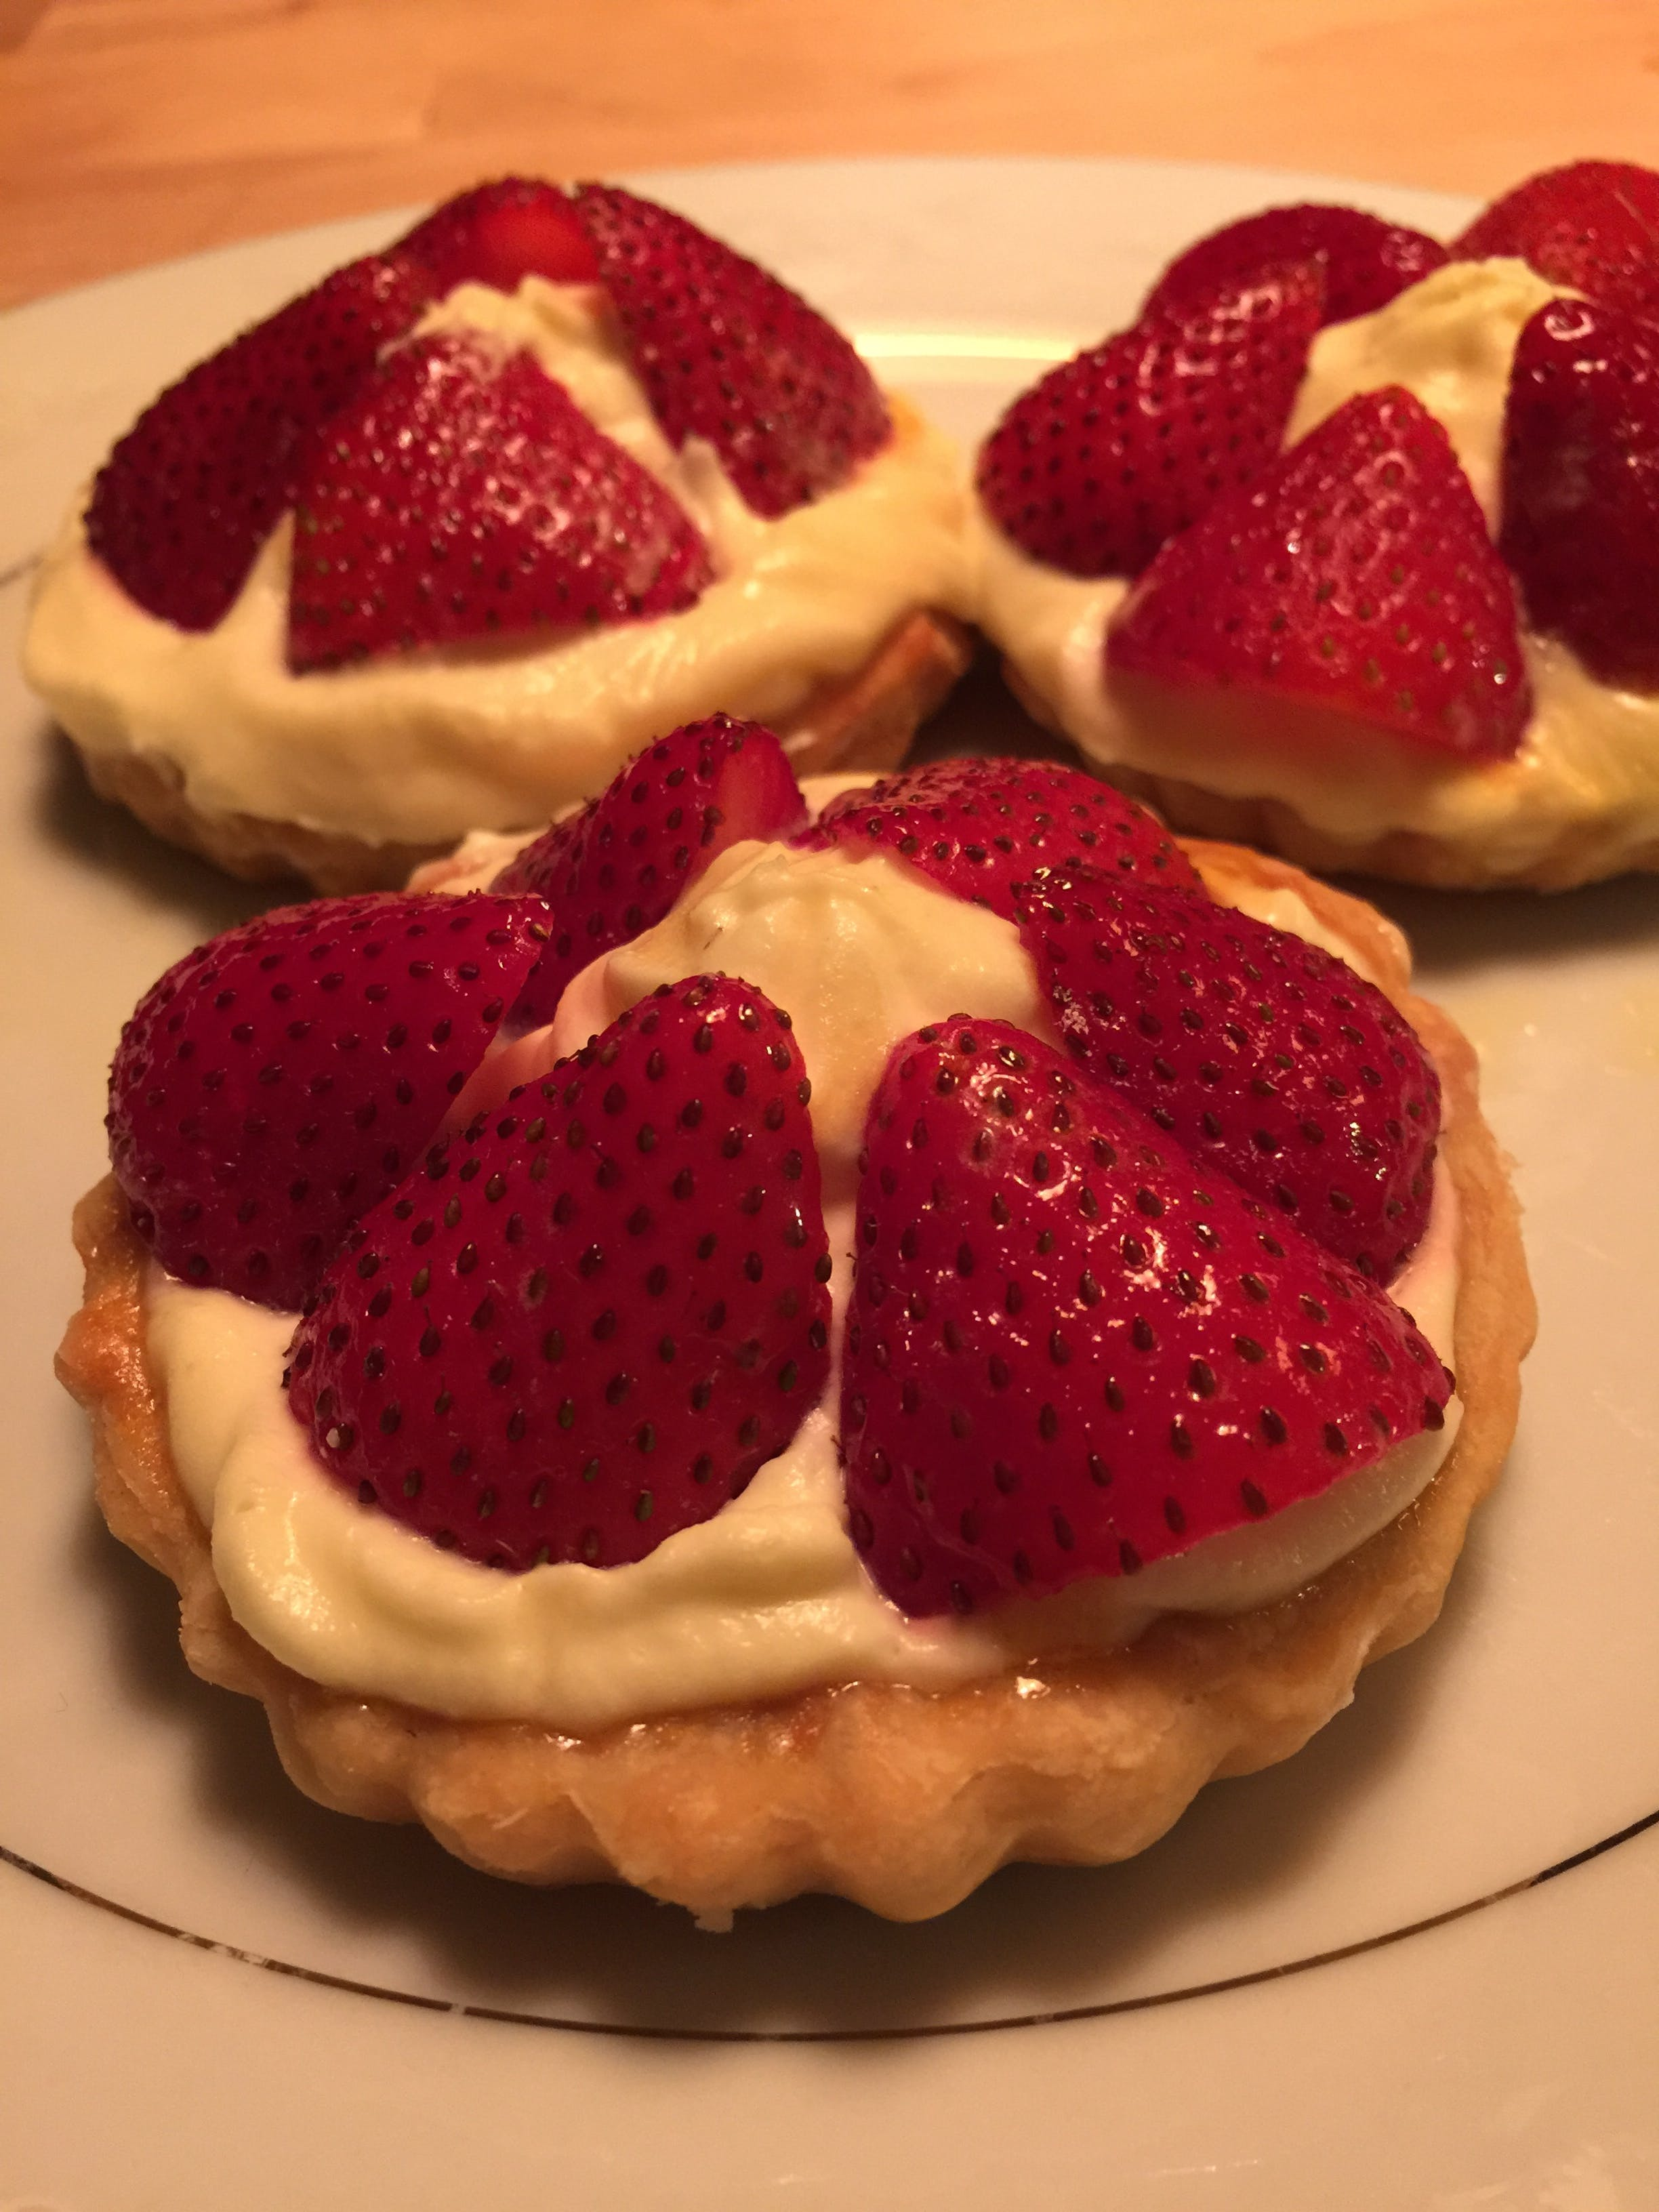 Free stock photo of dessert, strawberries, pastry, tarts